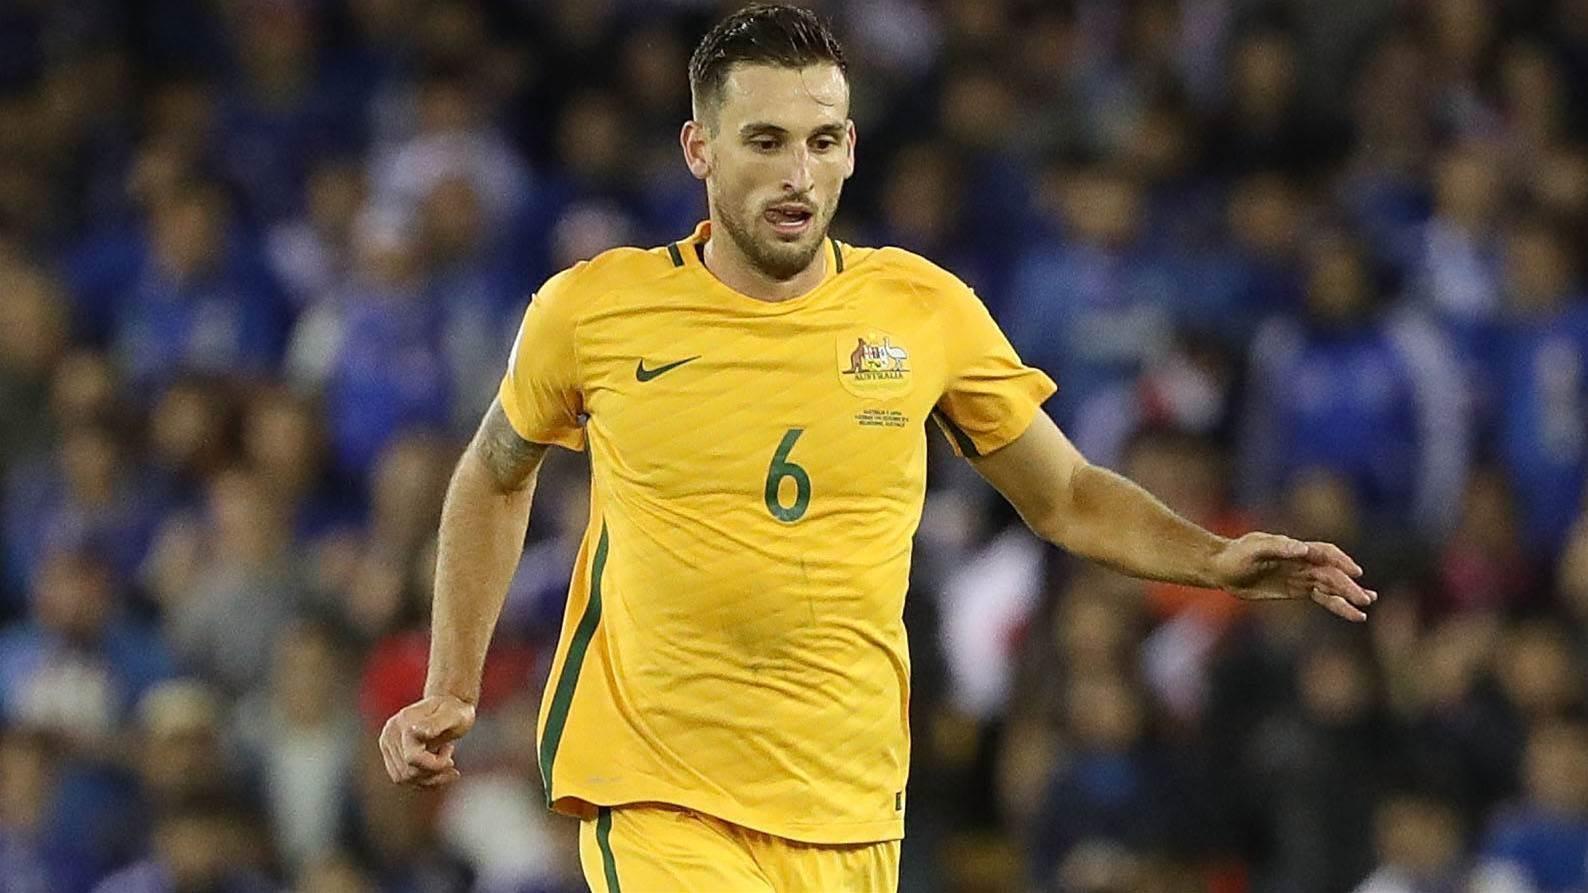 Postecoglou urges Spiranovic to move clubs